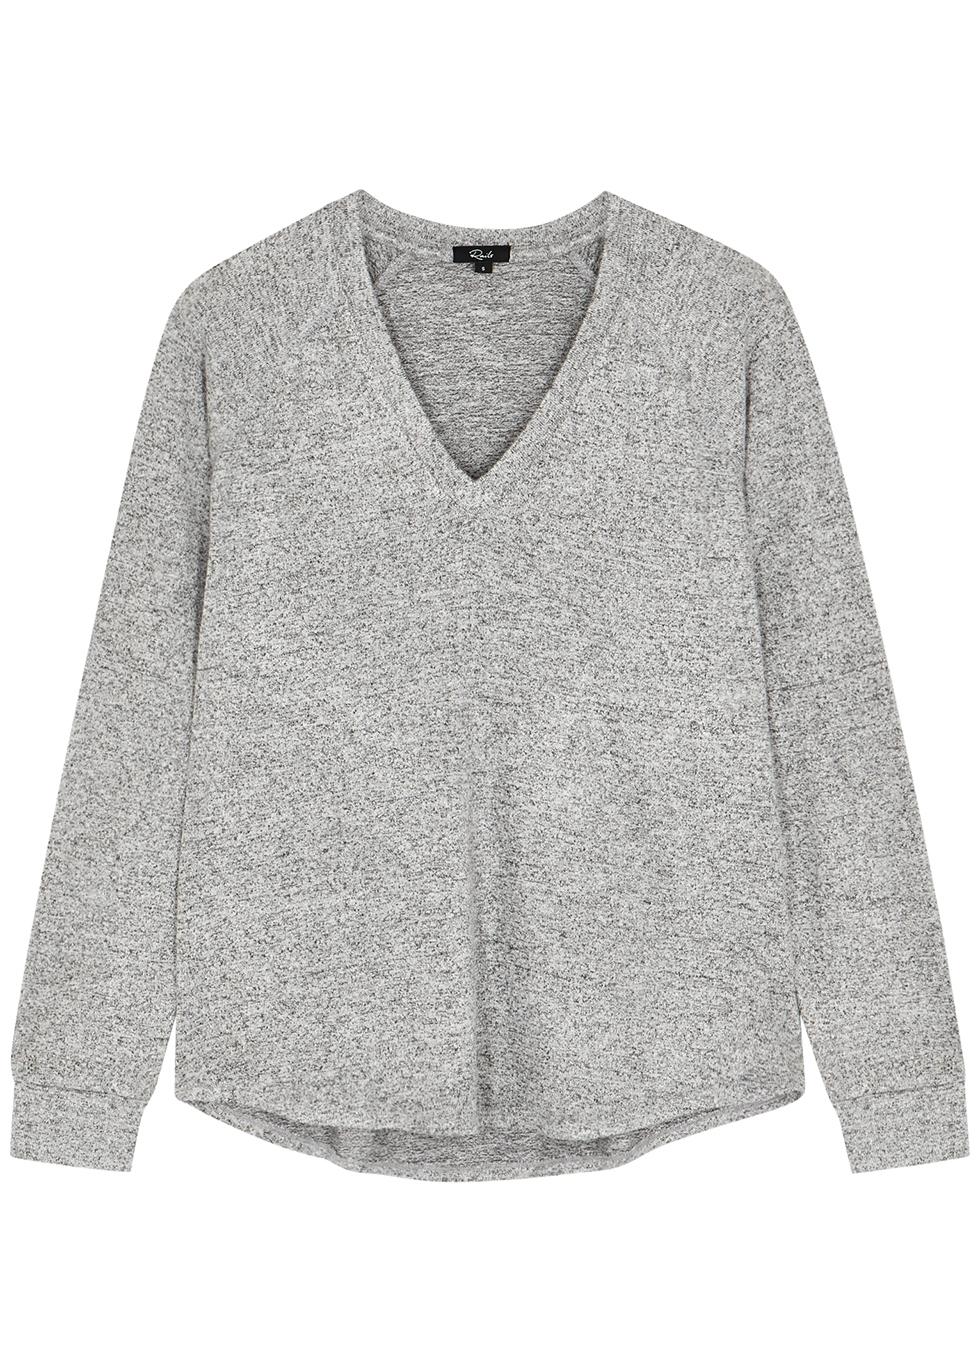 Thalia grey mélange stretch-knit jumper